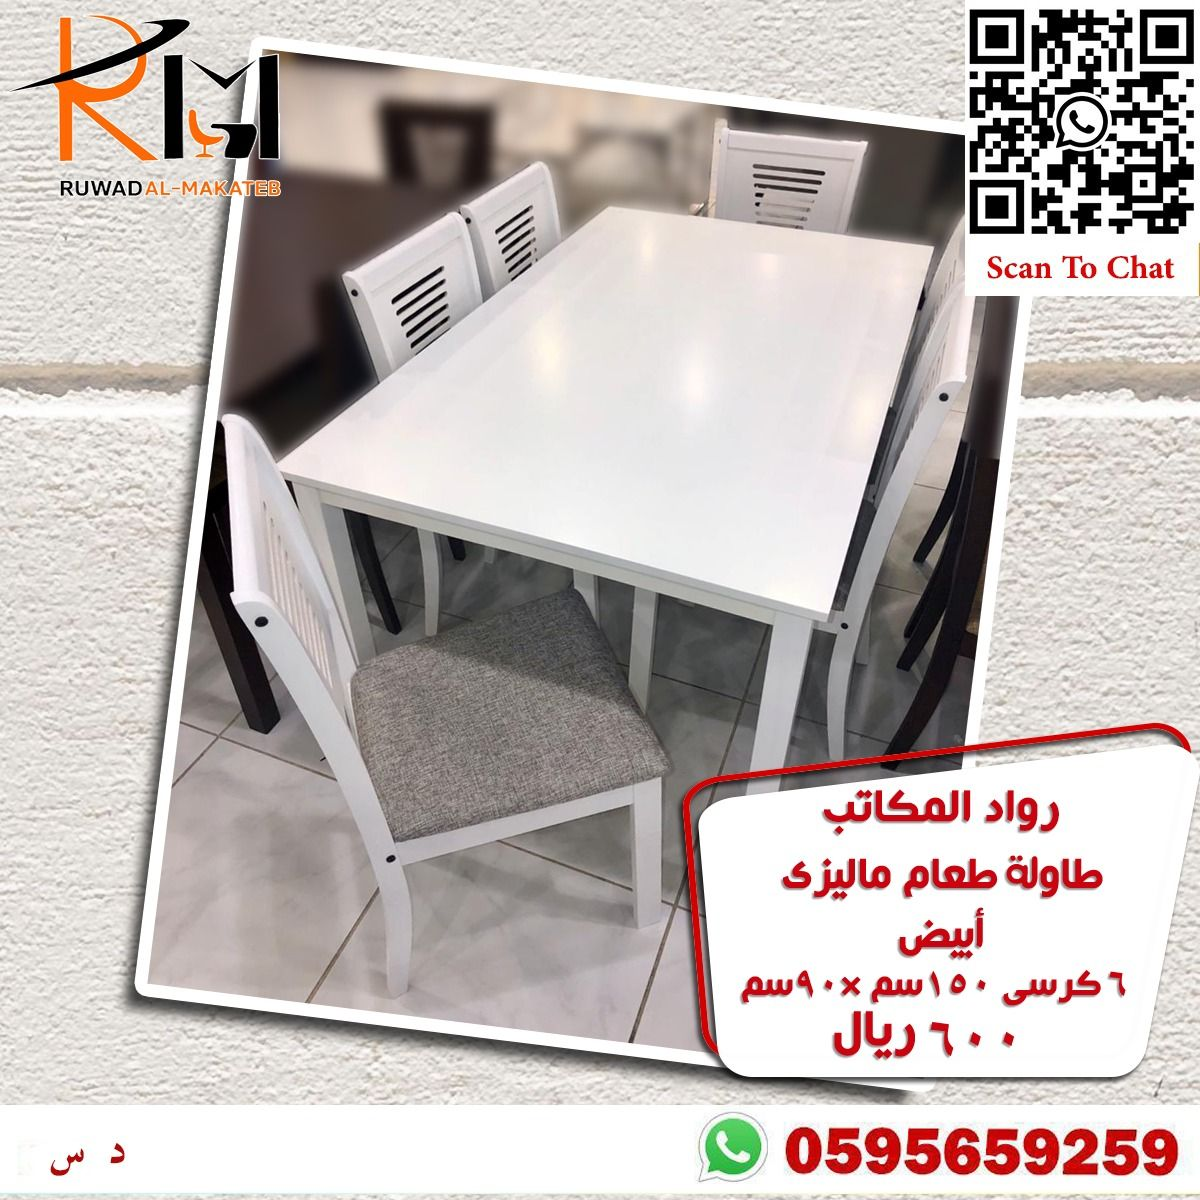 طاولة طعام ماليزي Home Decor Decor Furniture